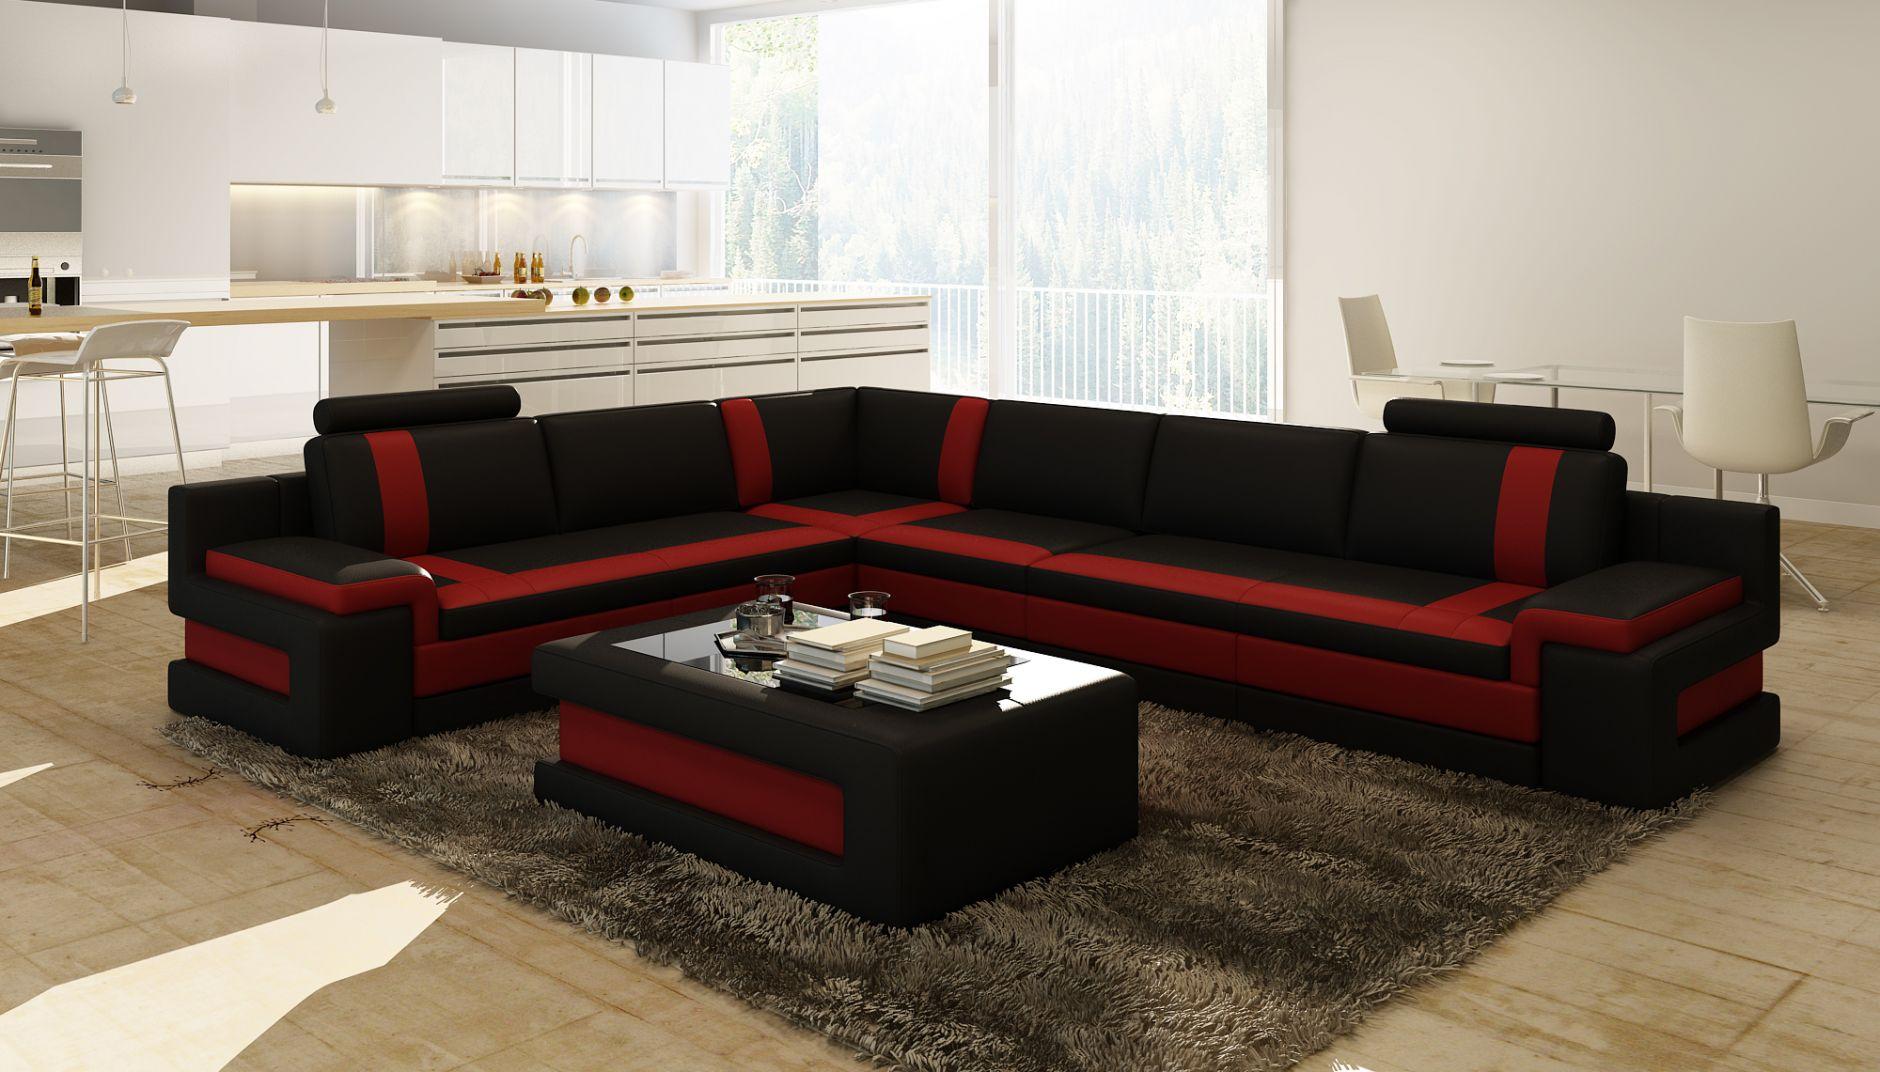 schnittsofa schnittsofa modell 5083die m bel aus italien. Black Bedroom Furniture Sets. Home Design Ideas